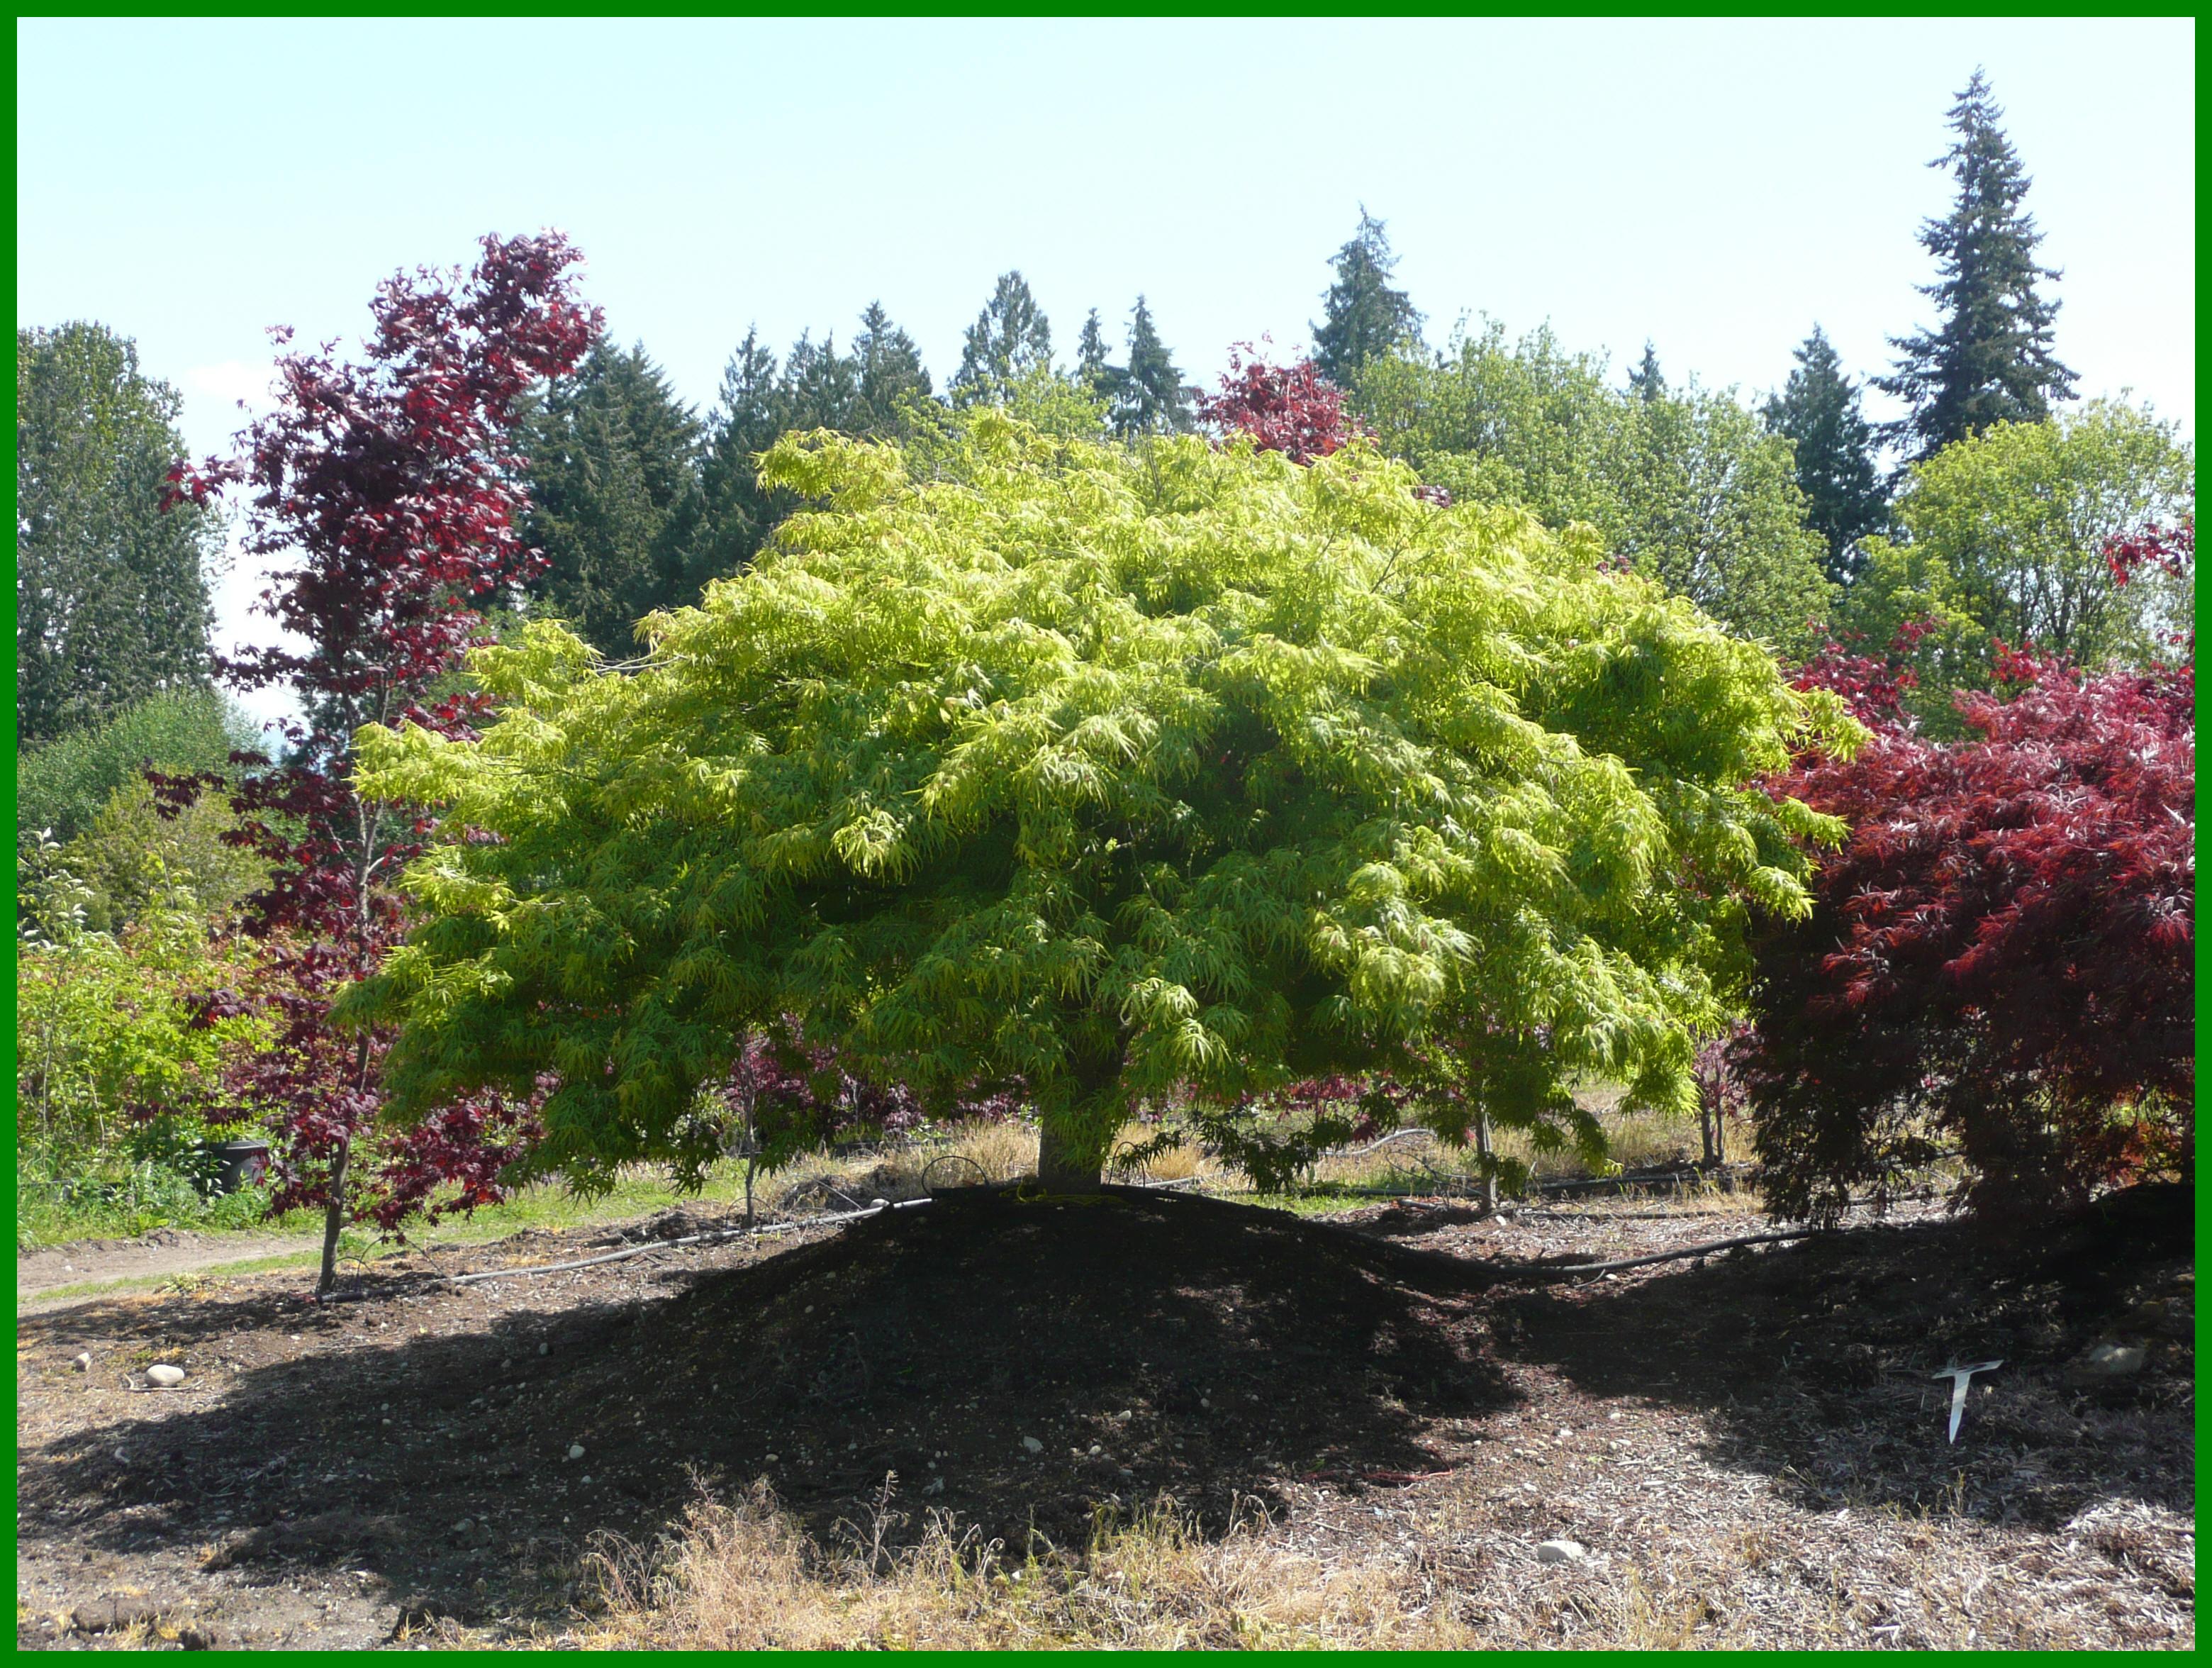 Peaceably Laceleaf Japanese Maple Trees Available Washington Green Japanese Maple Leaves Green Japanese Maple Images houzz-03 Green Japanese Maple